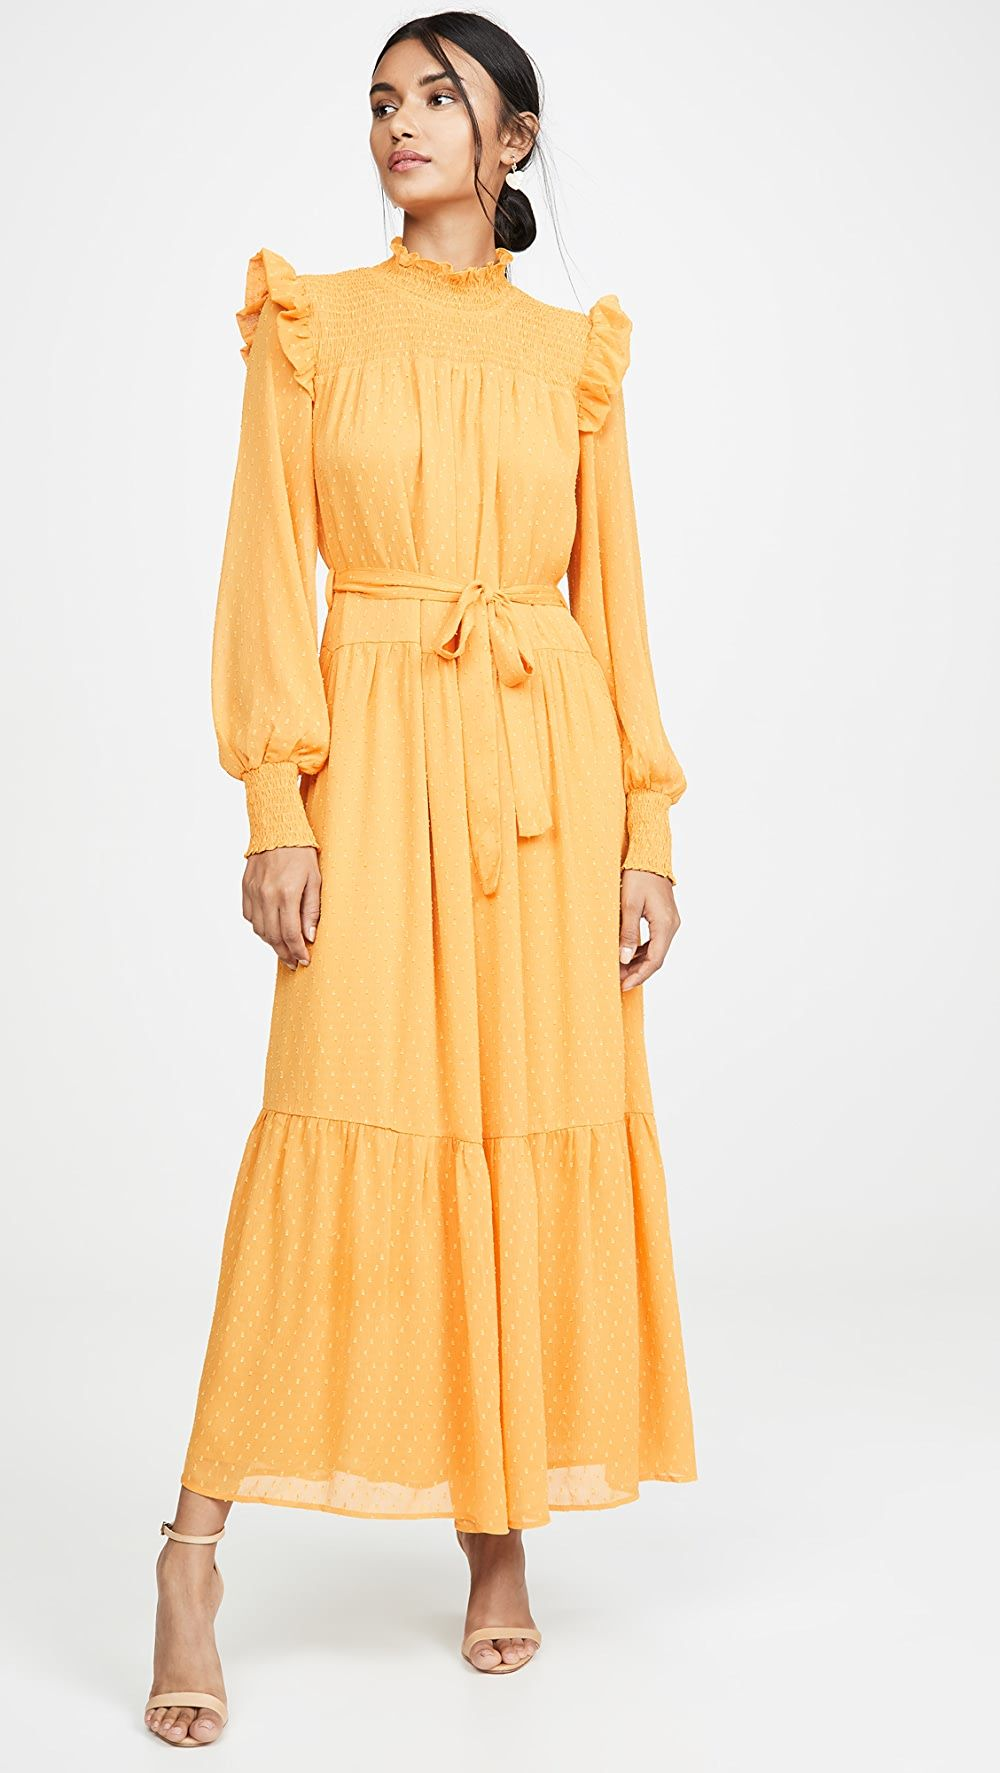 English Factory Swiss Dot Smocked Maxi Dress In 2021 Smocked Maxi Dresses Maxi Dress Summer Dresses [ 1773 x 1000 Pixel ]